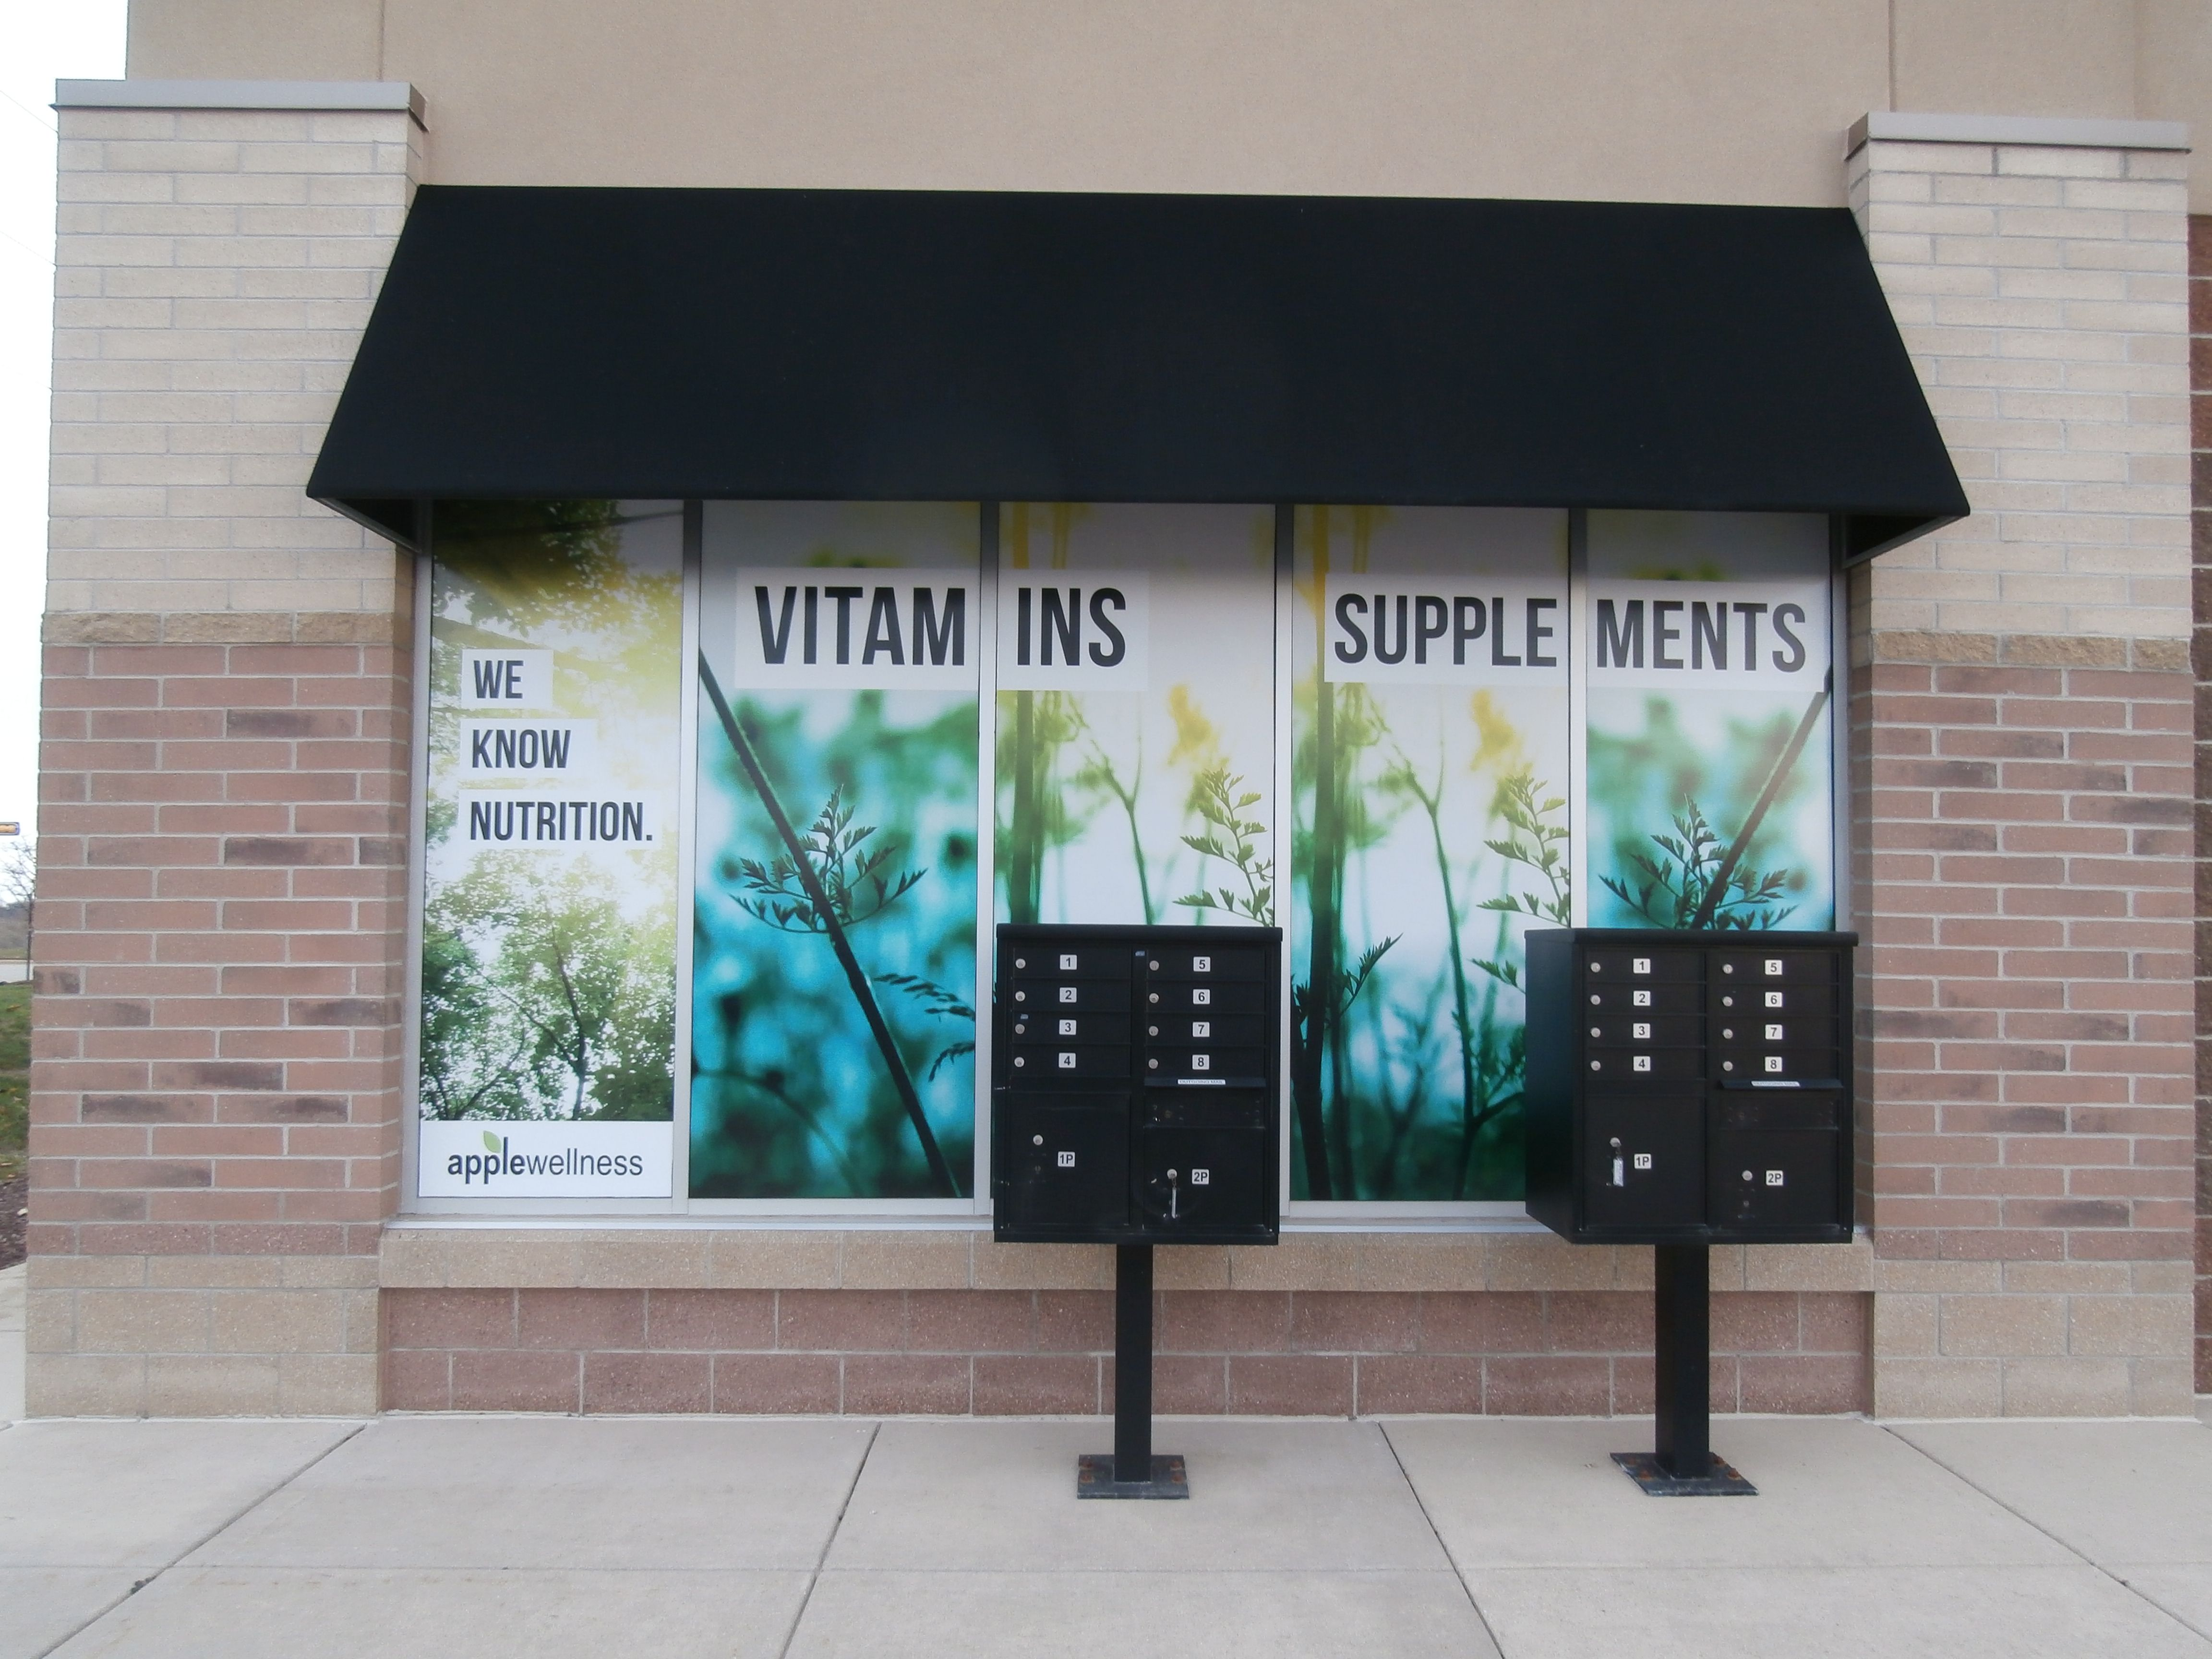 Apple Wellness Window Wraps Done By Monarch Media Designs In